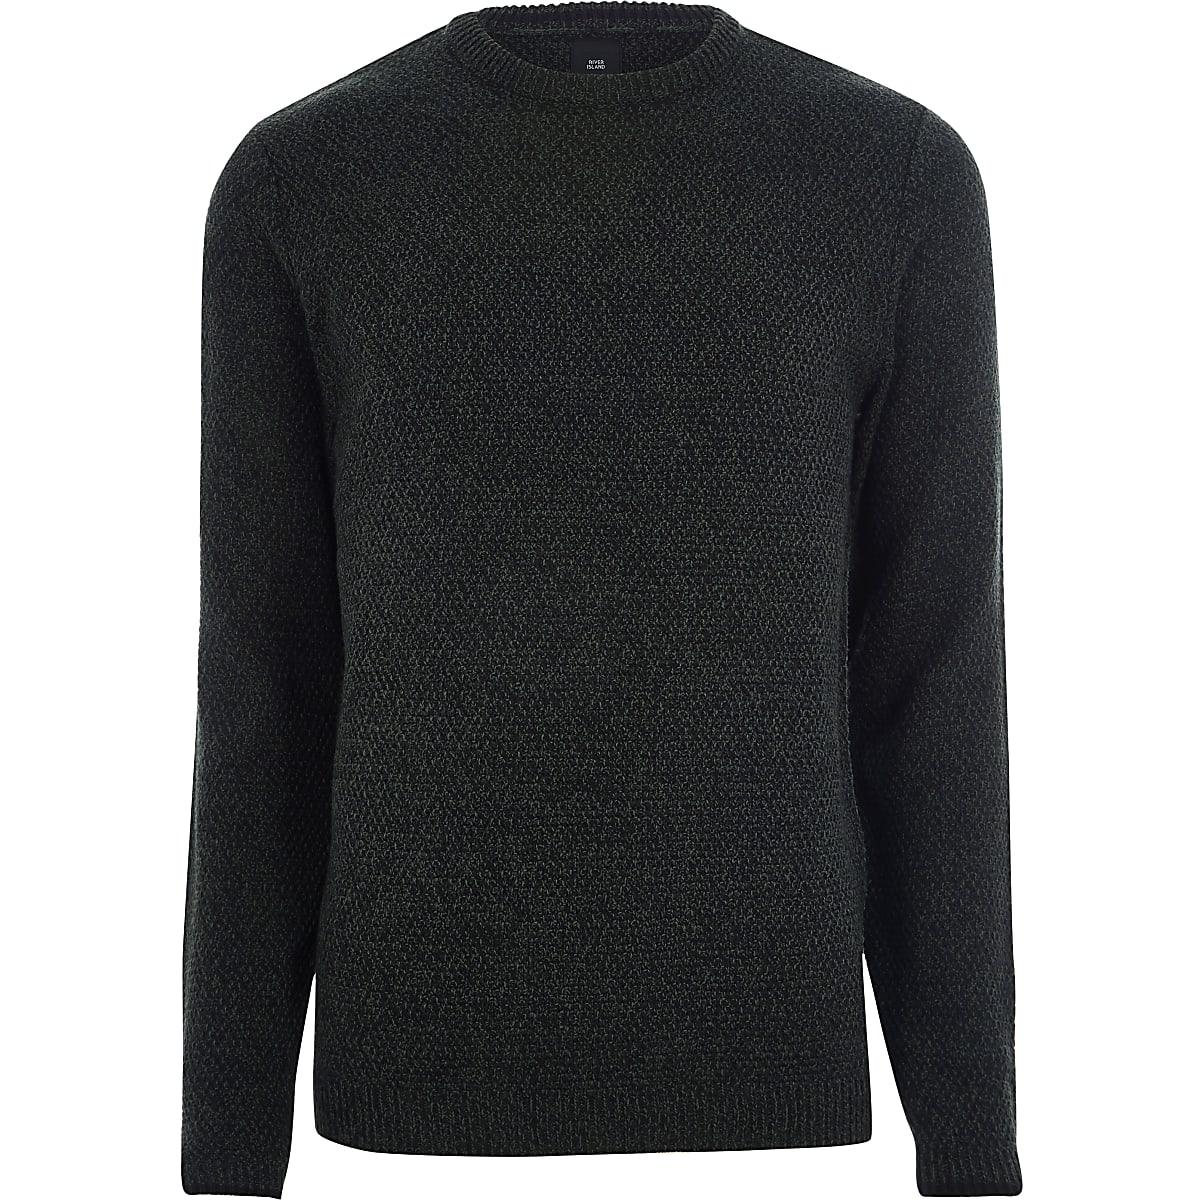 Green textured knit slim fit crew neck jumper